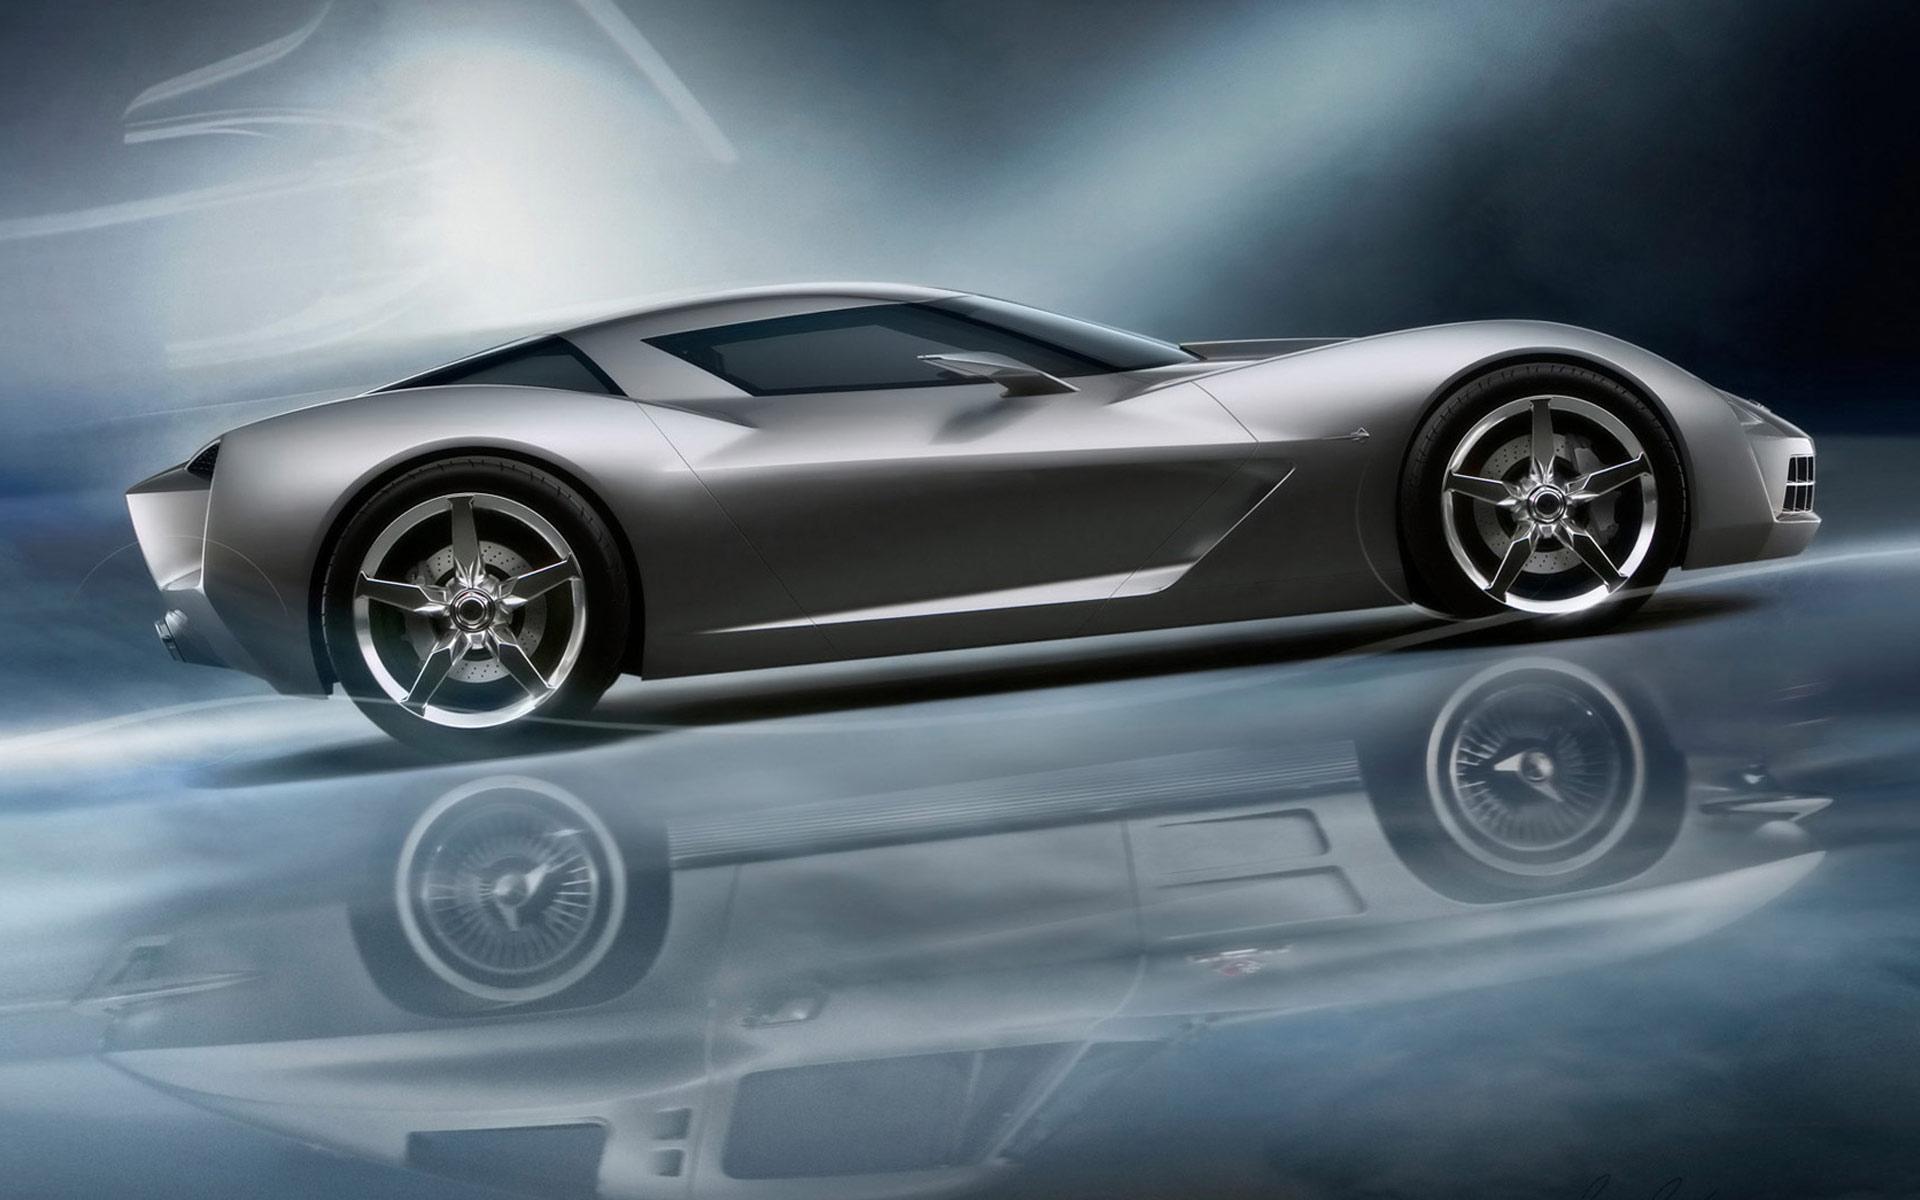 Cool Fast Sports Cars